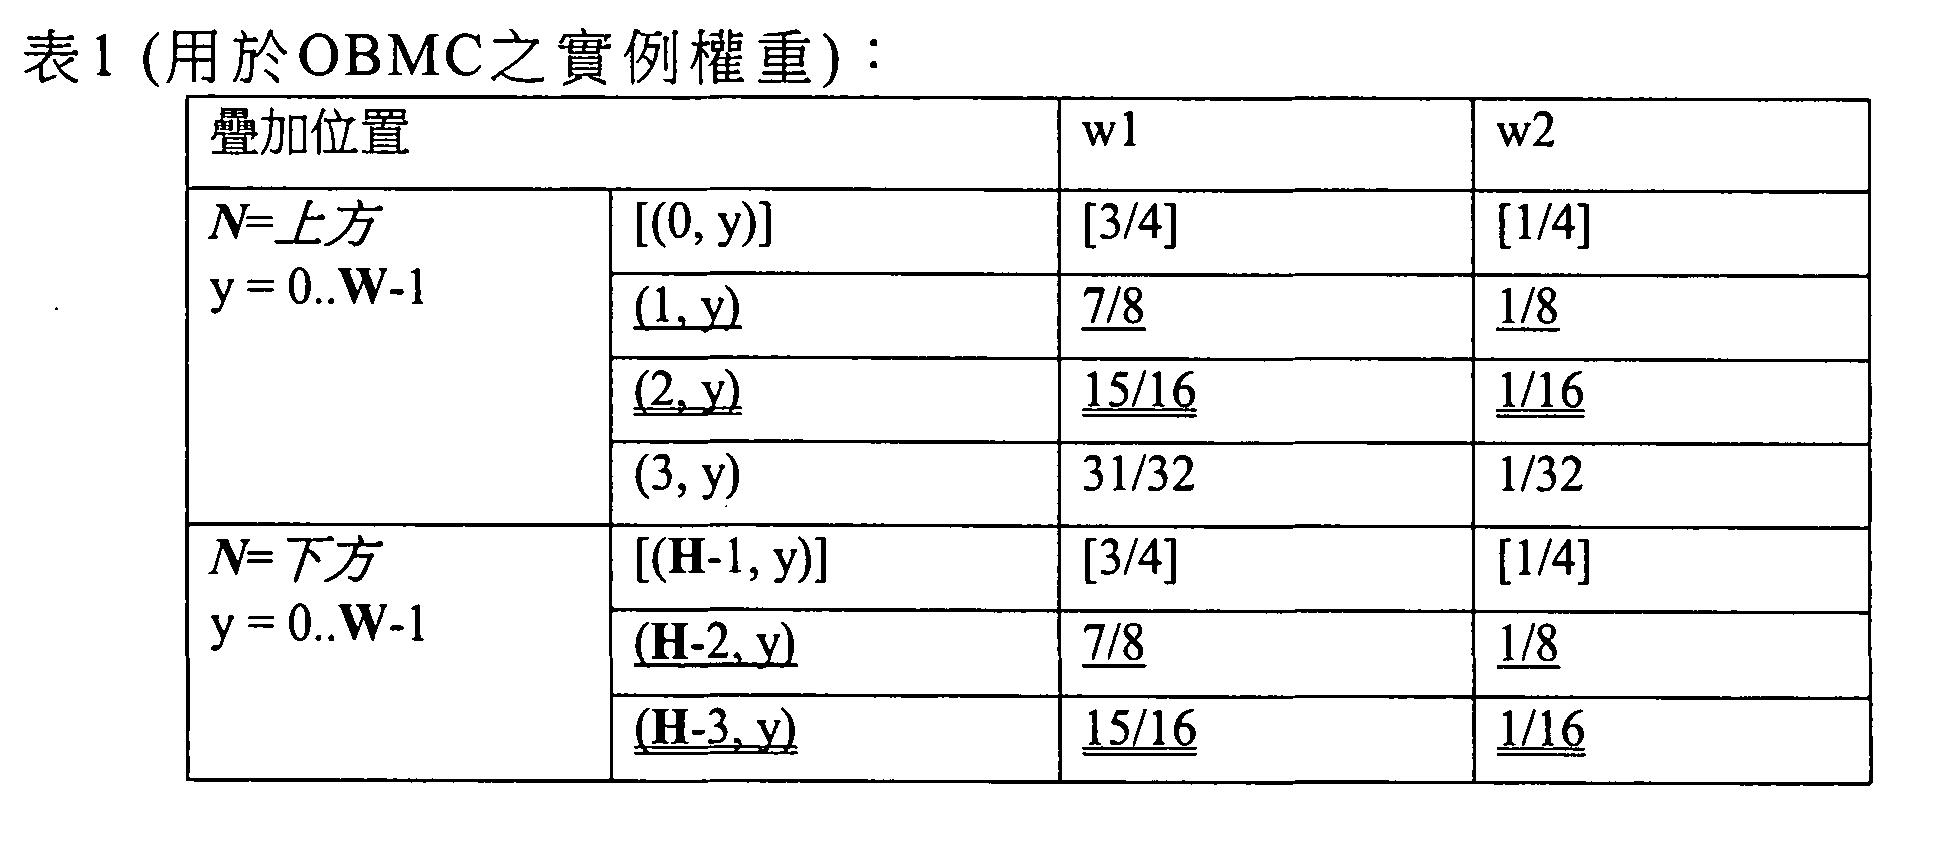 Figure 105102384-A0202-12-0036-1